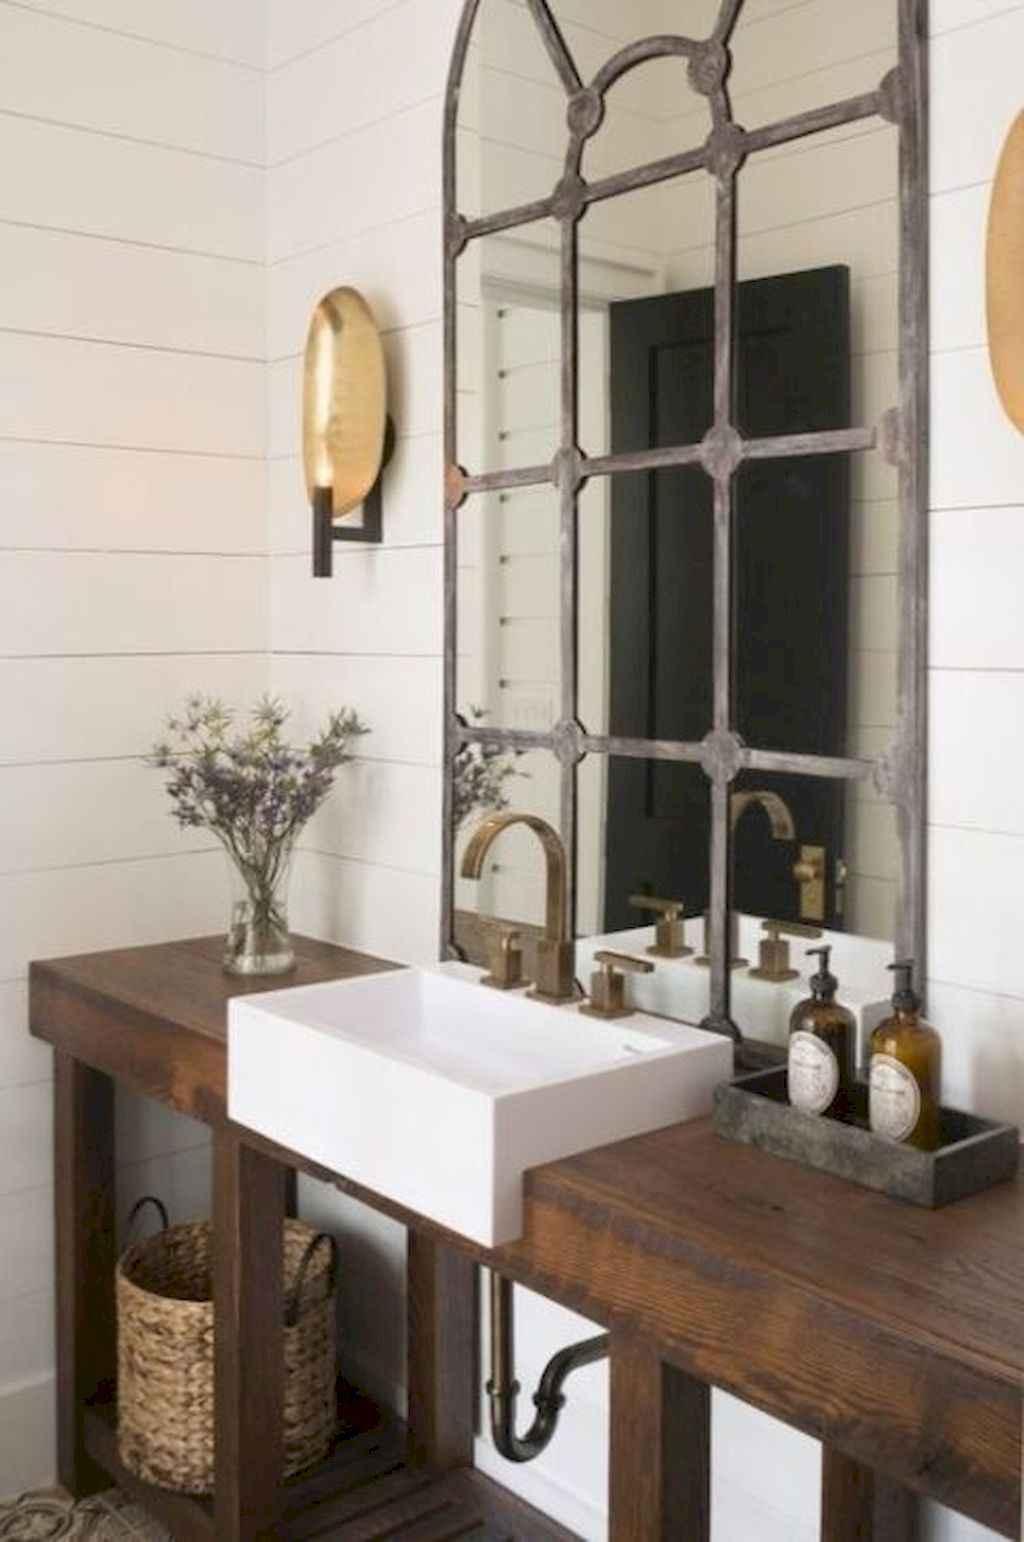 125 awesome farmhouse bathroom vanity remodel ideas (116)